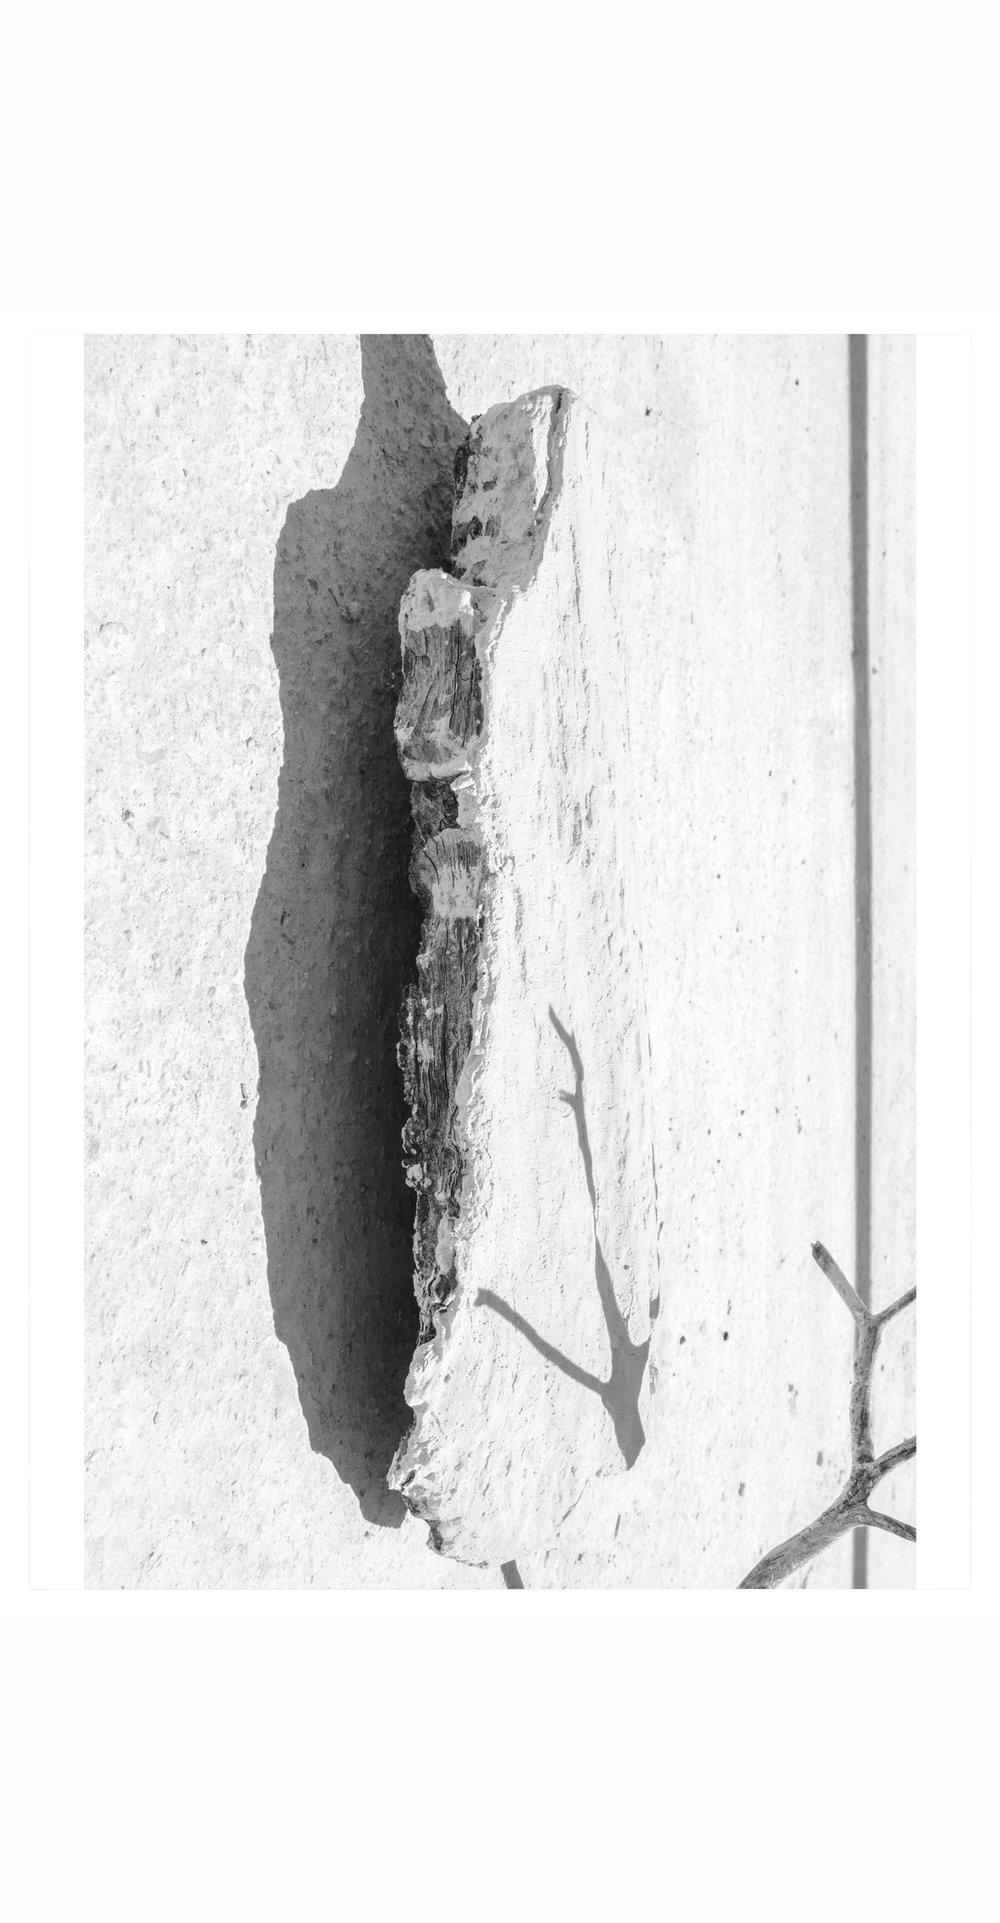 erosion4.jpg